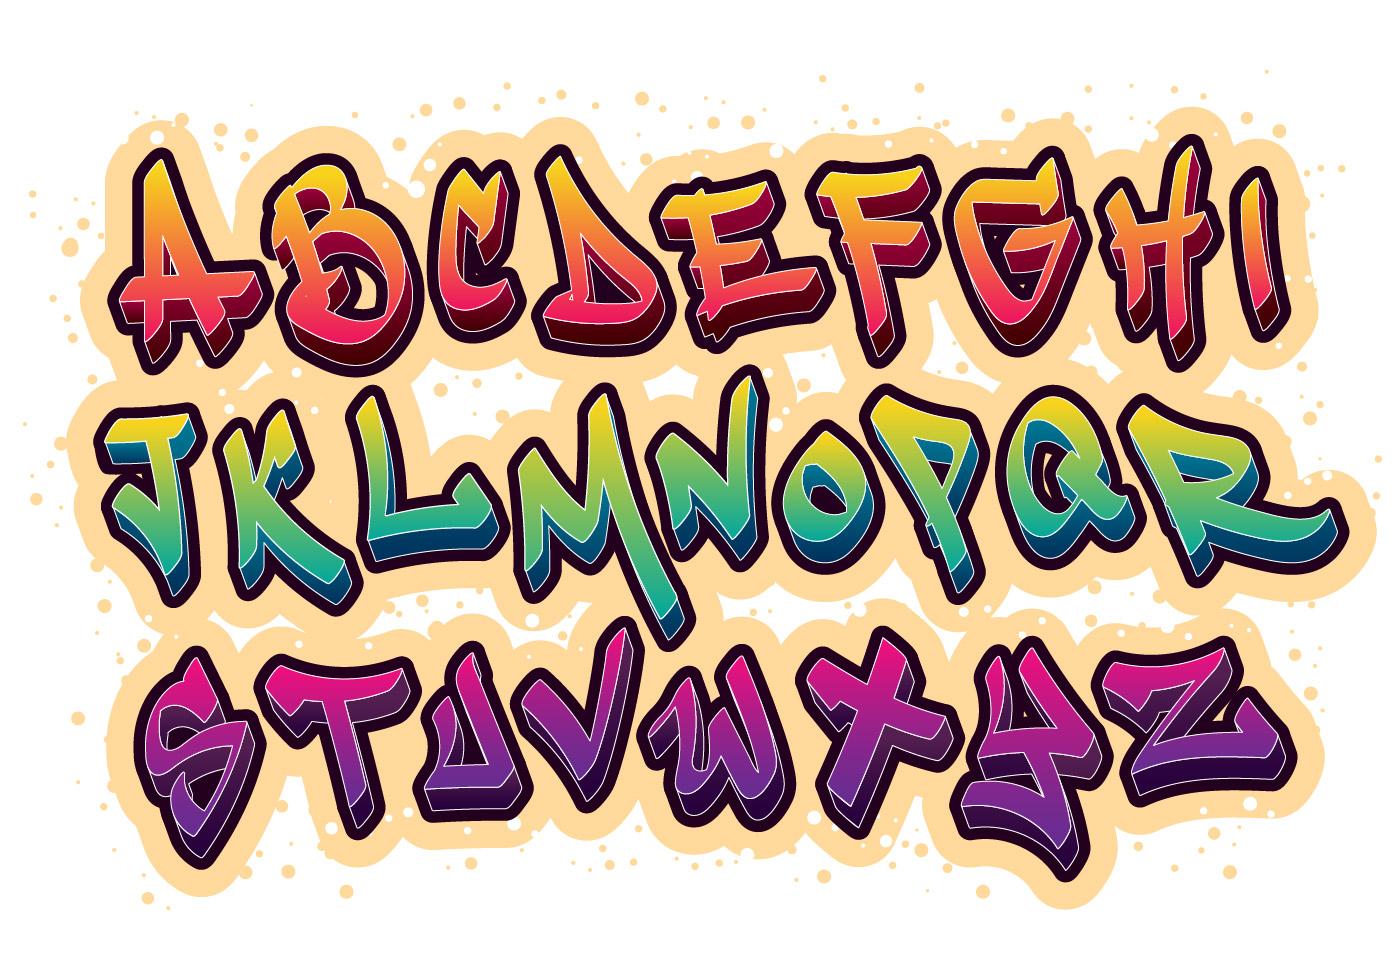 Grafiti font alphabet vector download free vector art stock graphics images